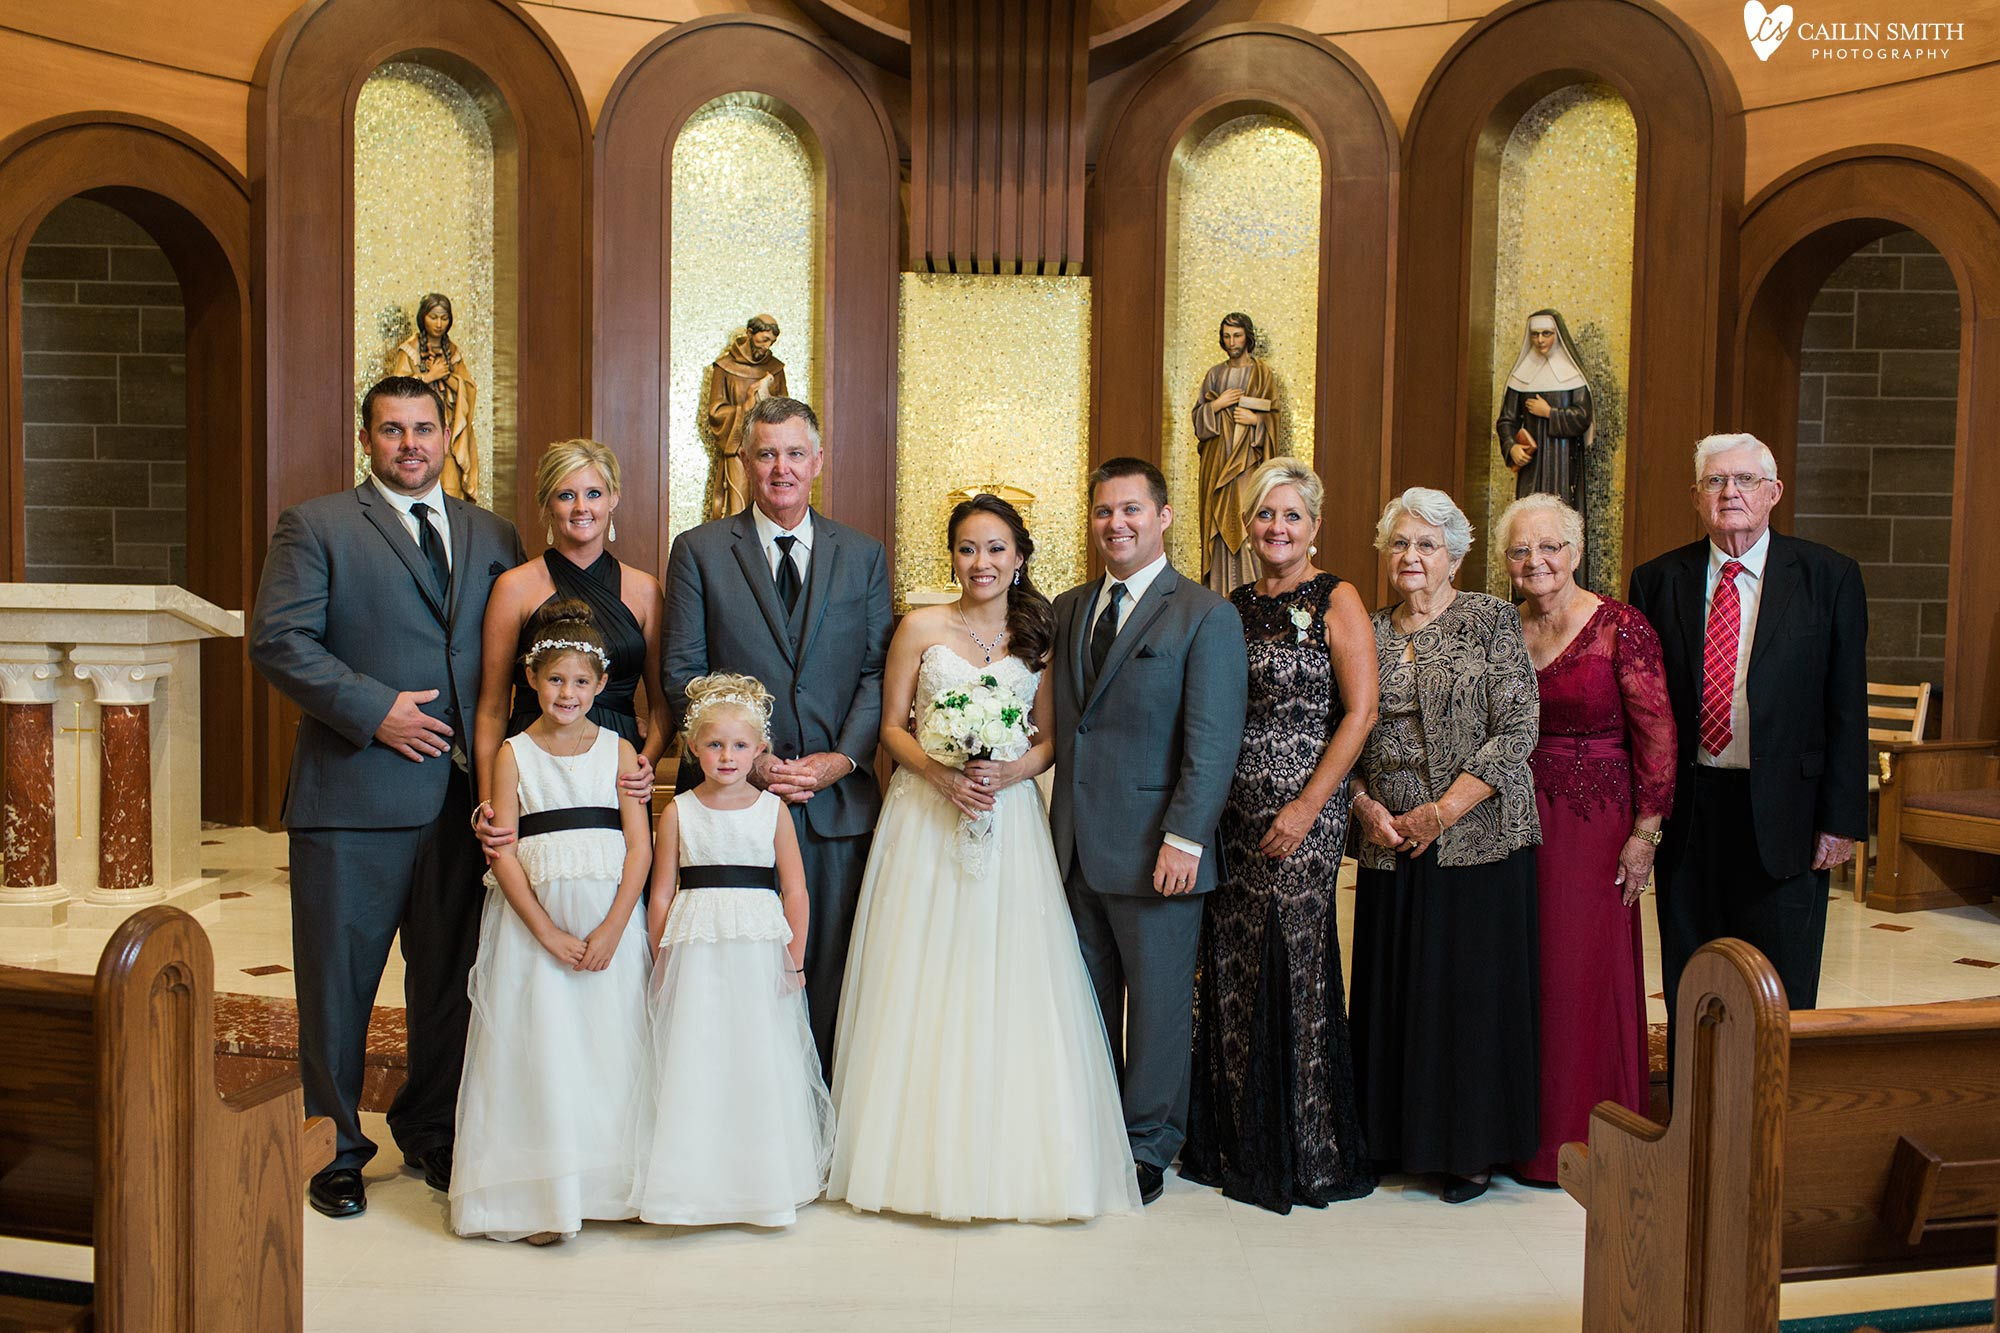 Jenifer_Dewey_Treasury_on_The_Plaza_Wedding_Photography_033.jpg